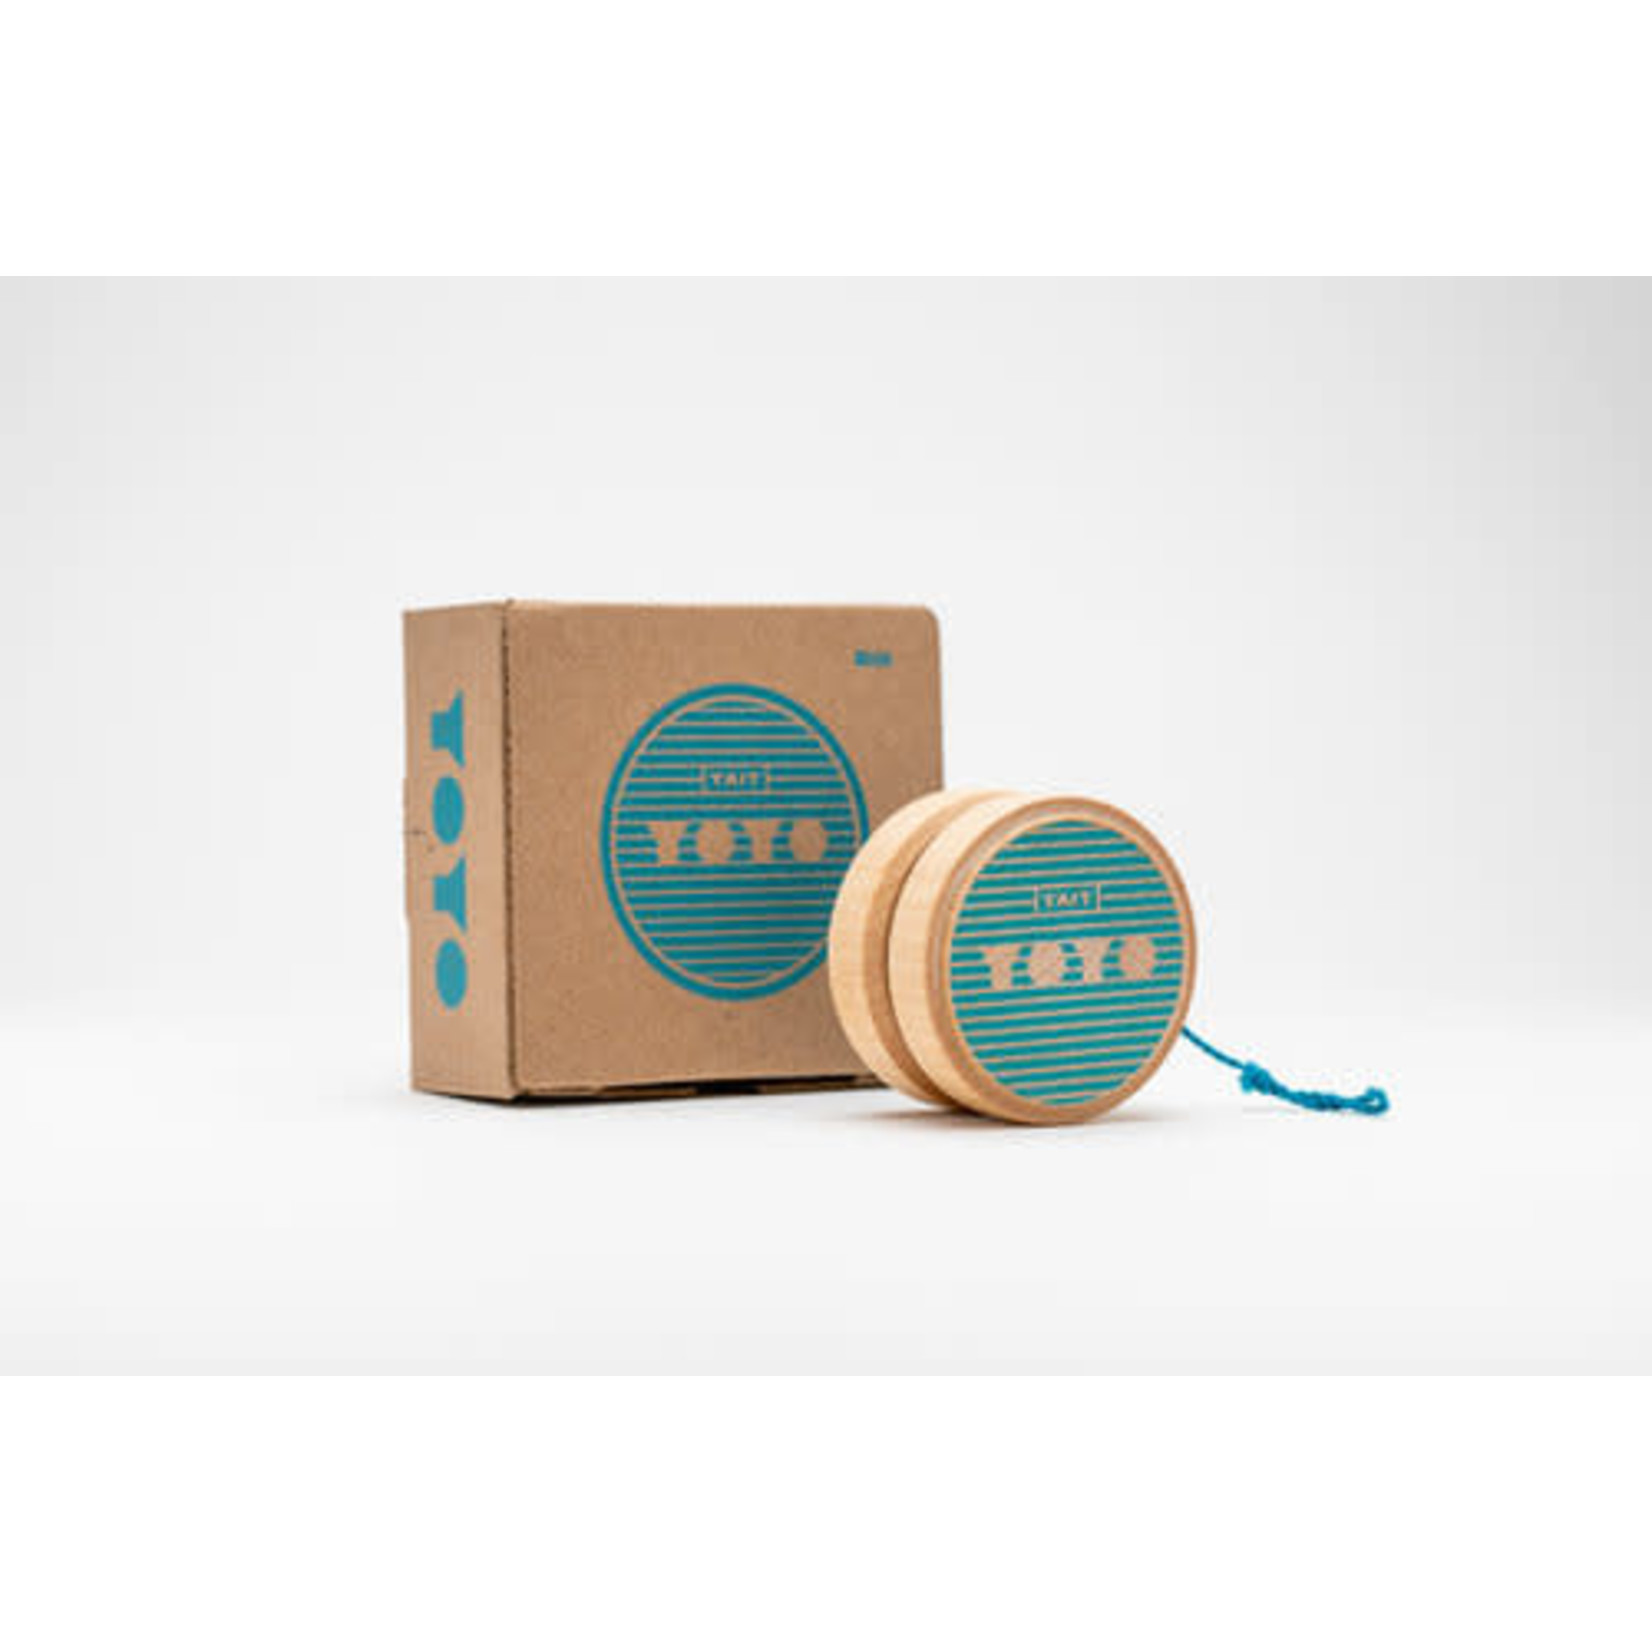 TAIT DESIGN CO. SLING-SLANG YOYO - BLUE